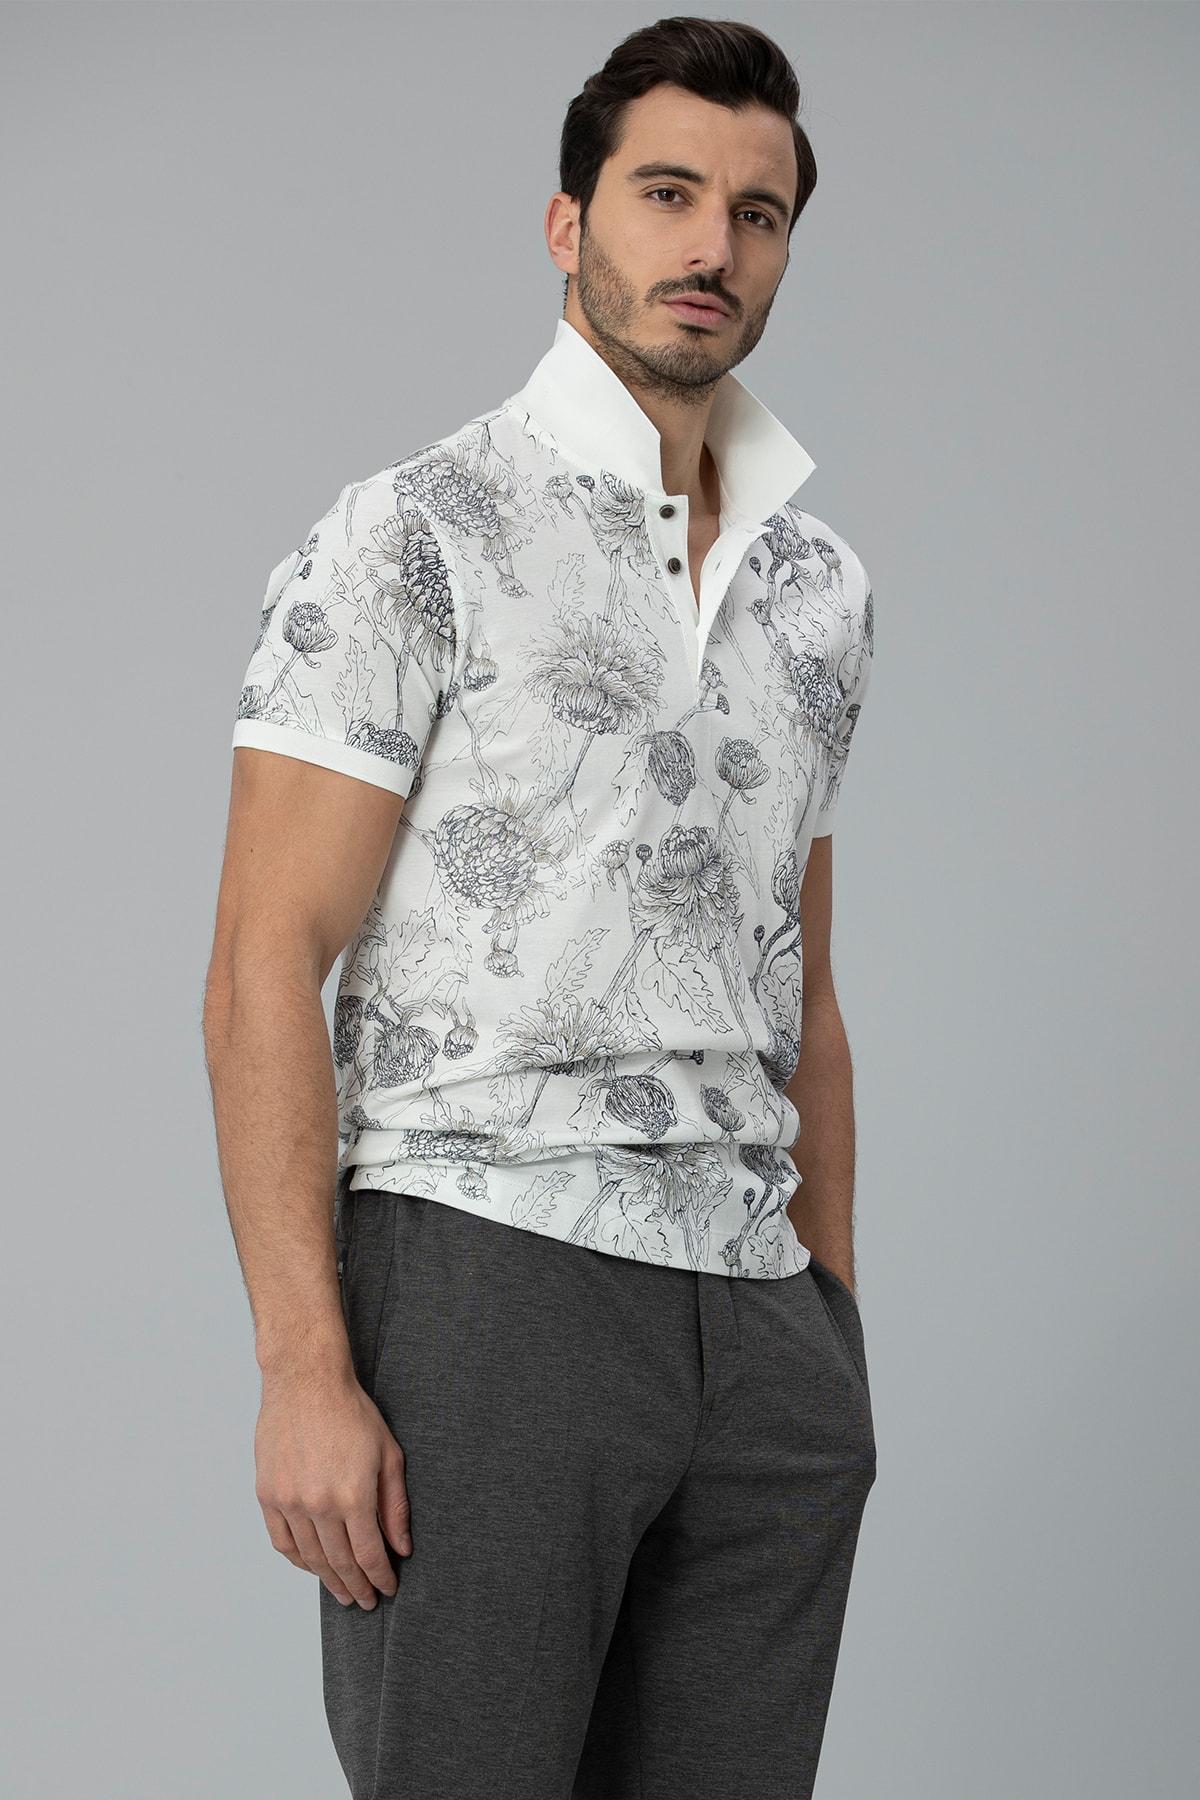 Lufian Capri Spor Polo T- Shirt Kırık Beyaz 2